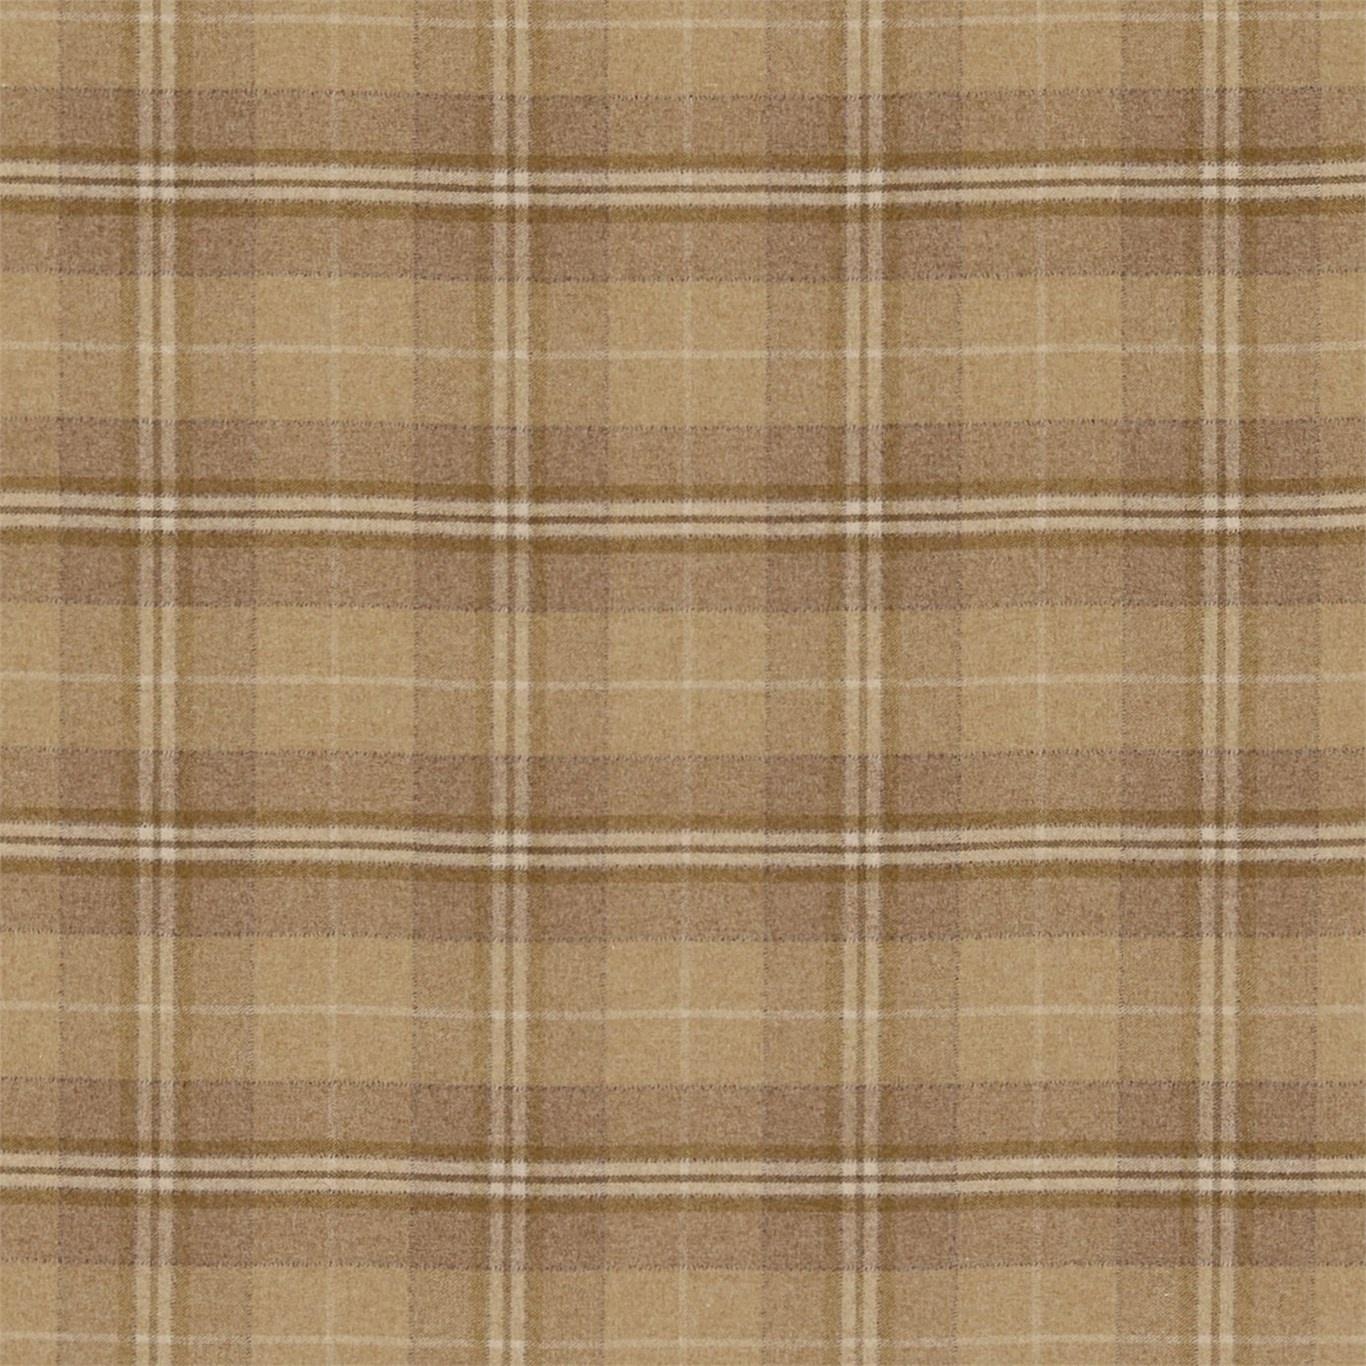 Image of Sanderson Milton Caramel Fabric 233251